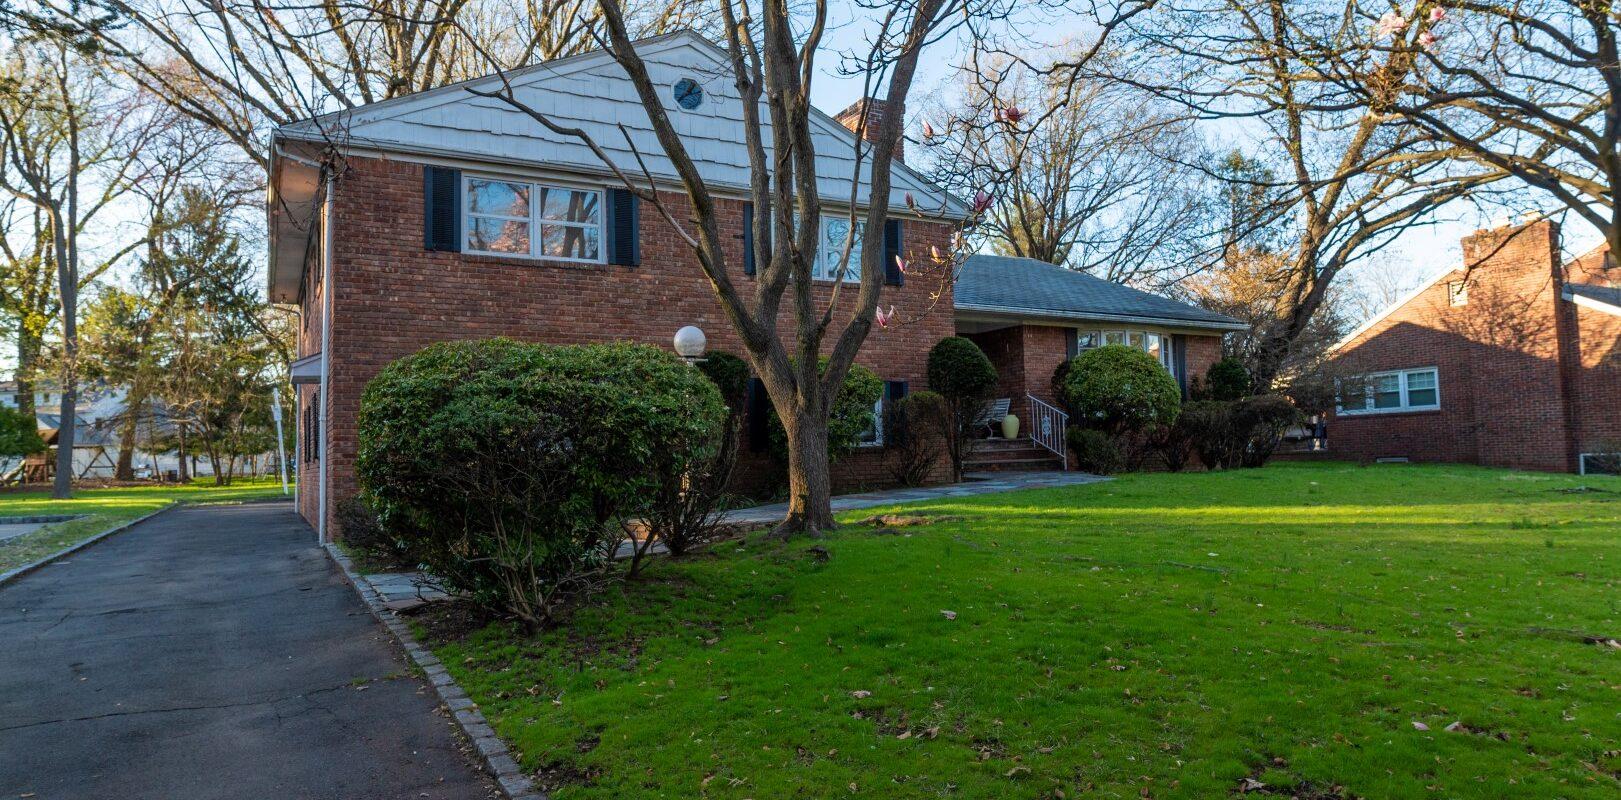 211 Surrey Rd Hillside, NJ 07205